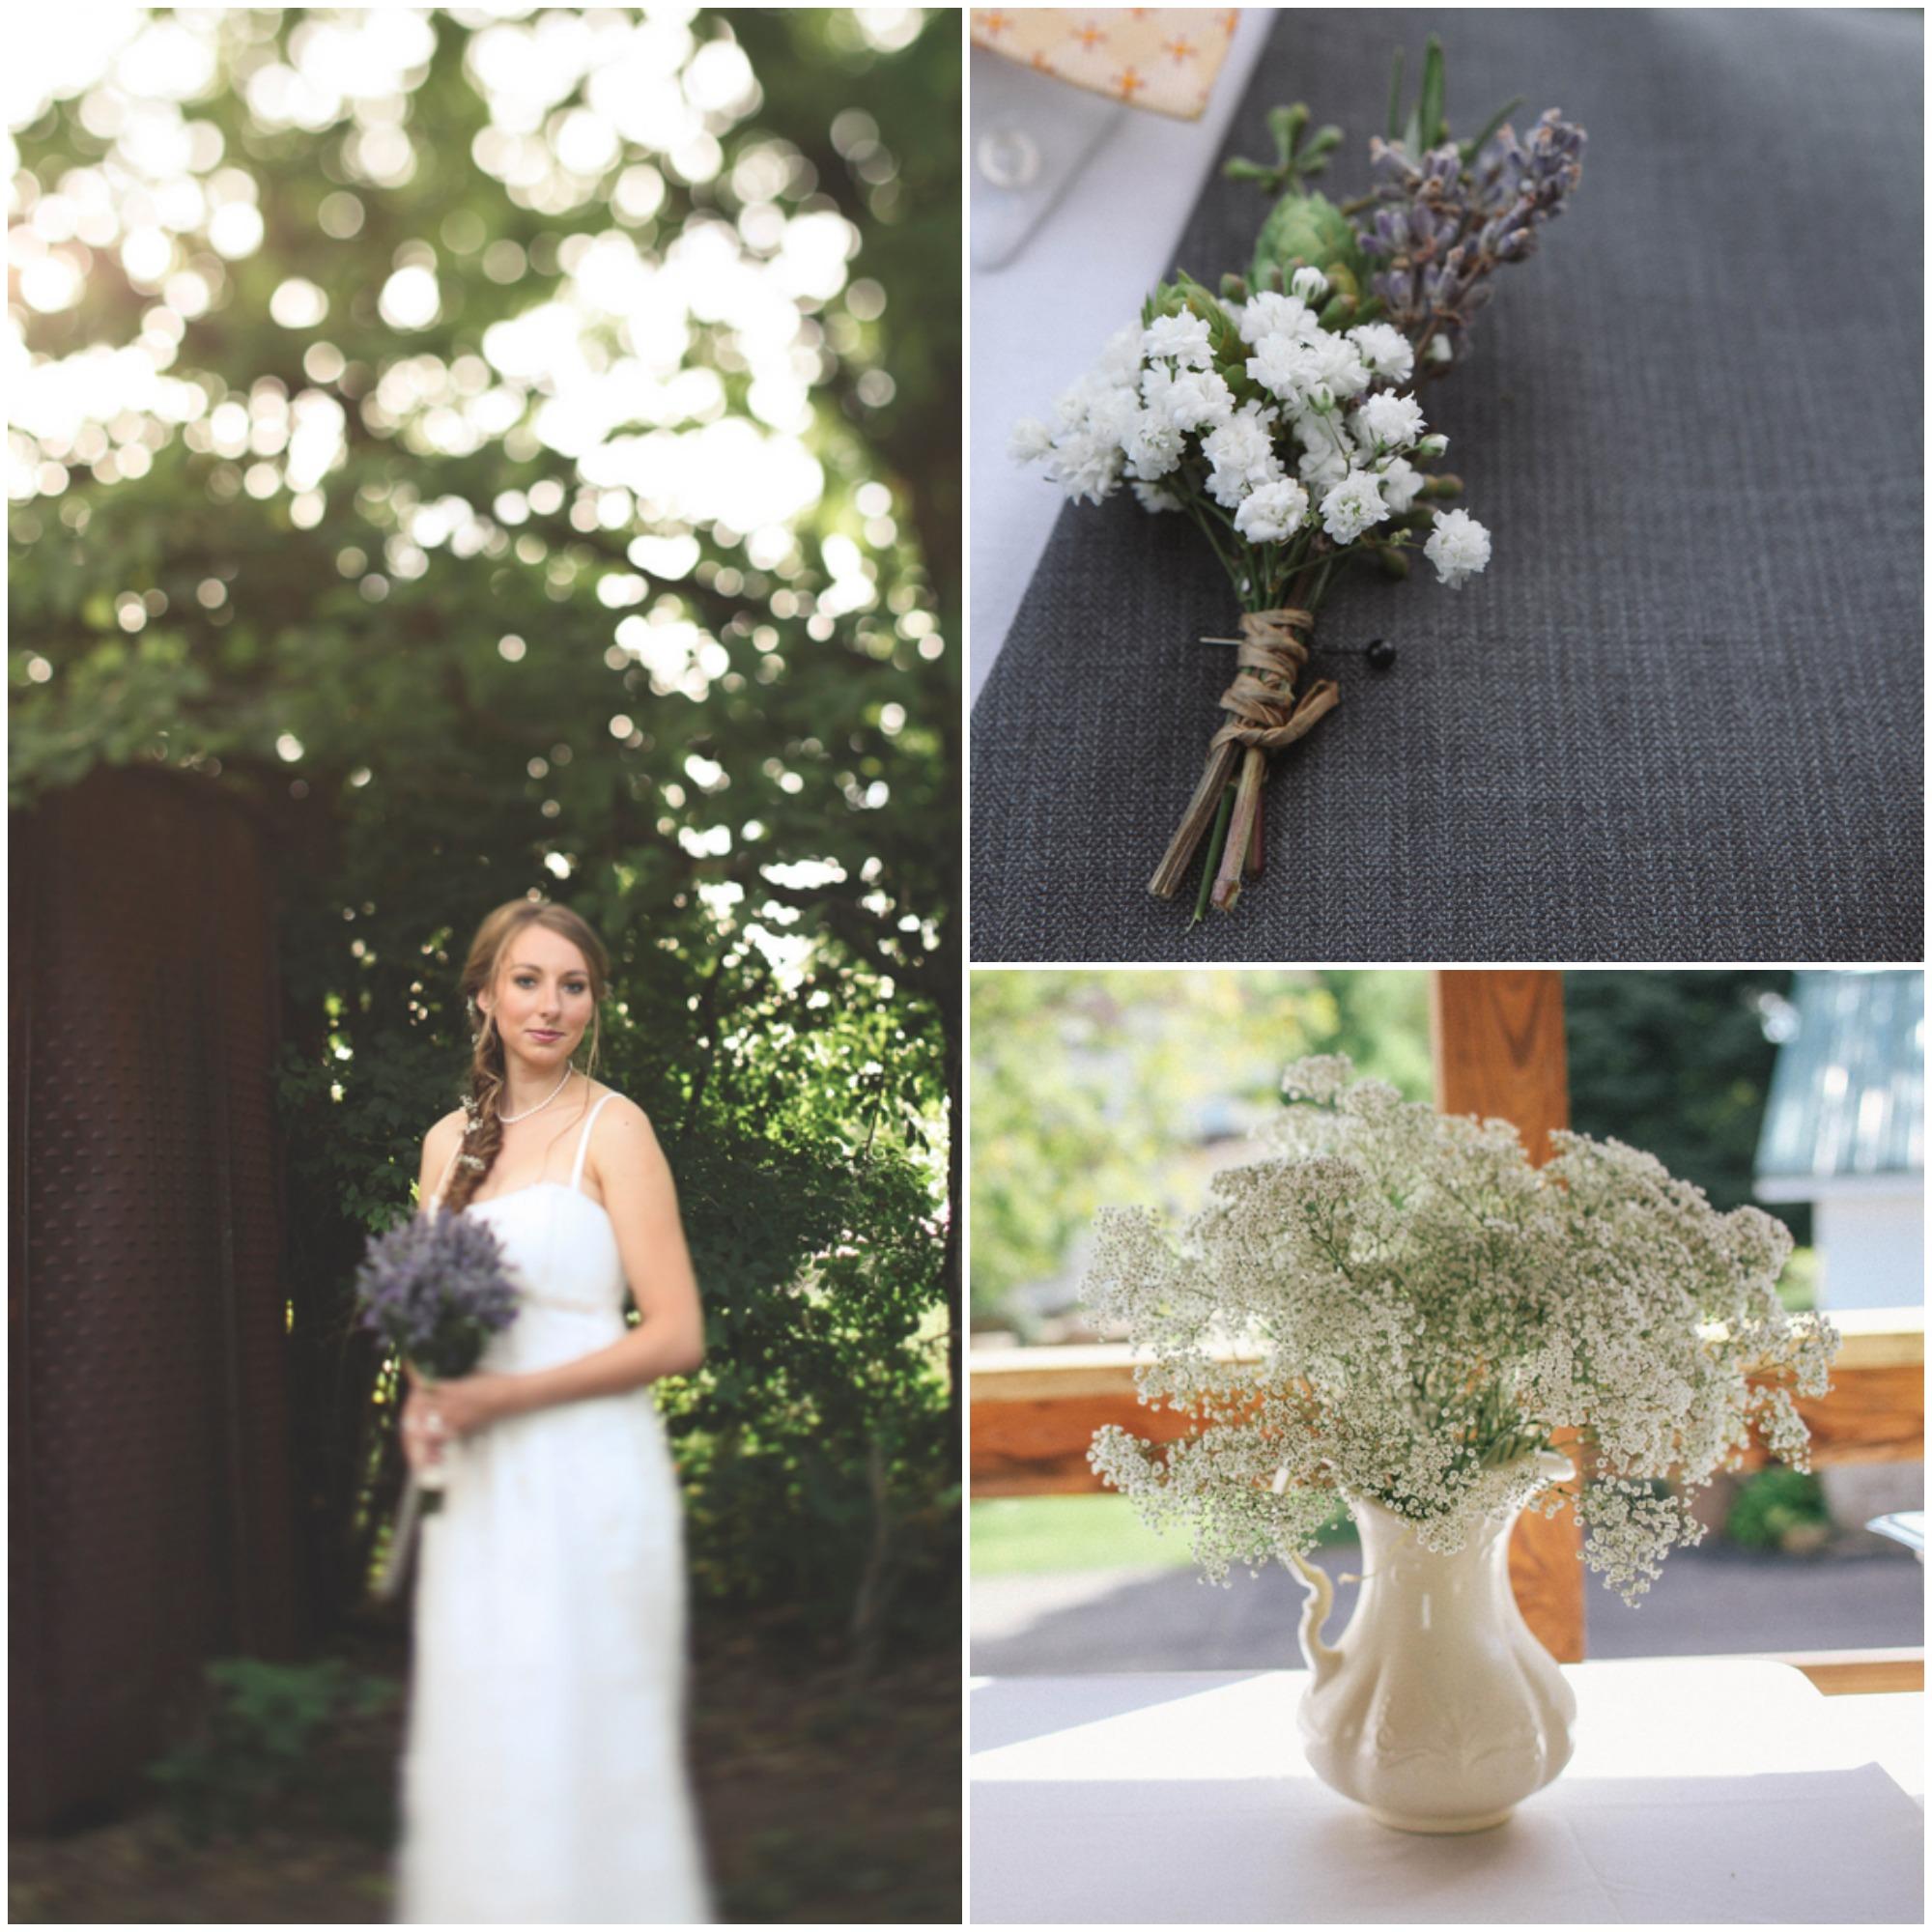 Rustic Wedding Chic: Barn Wedding In Ohio- Rustic Wedding Chic